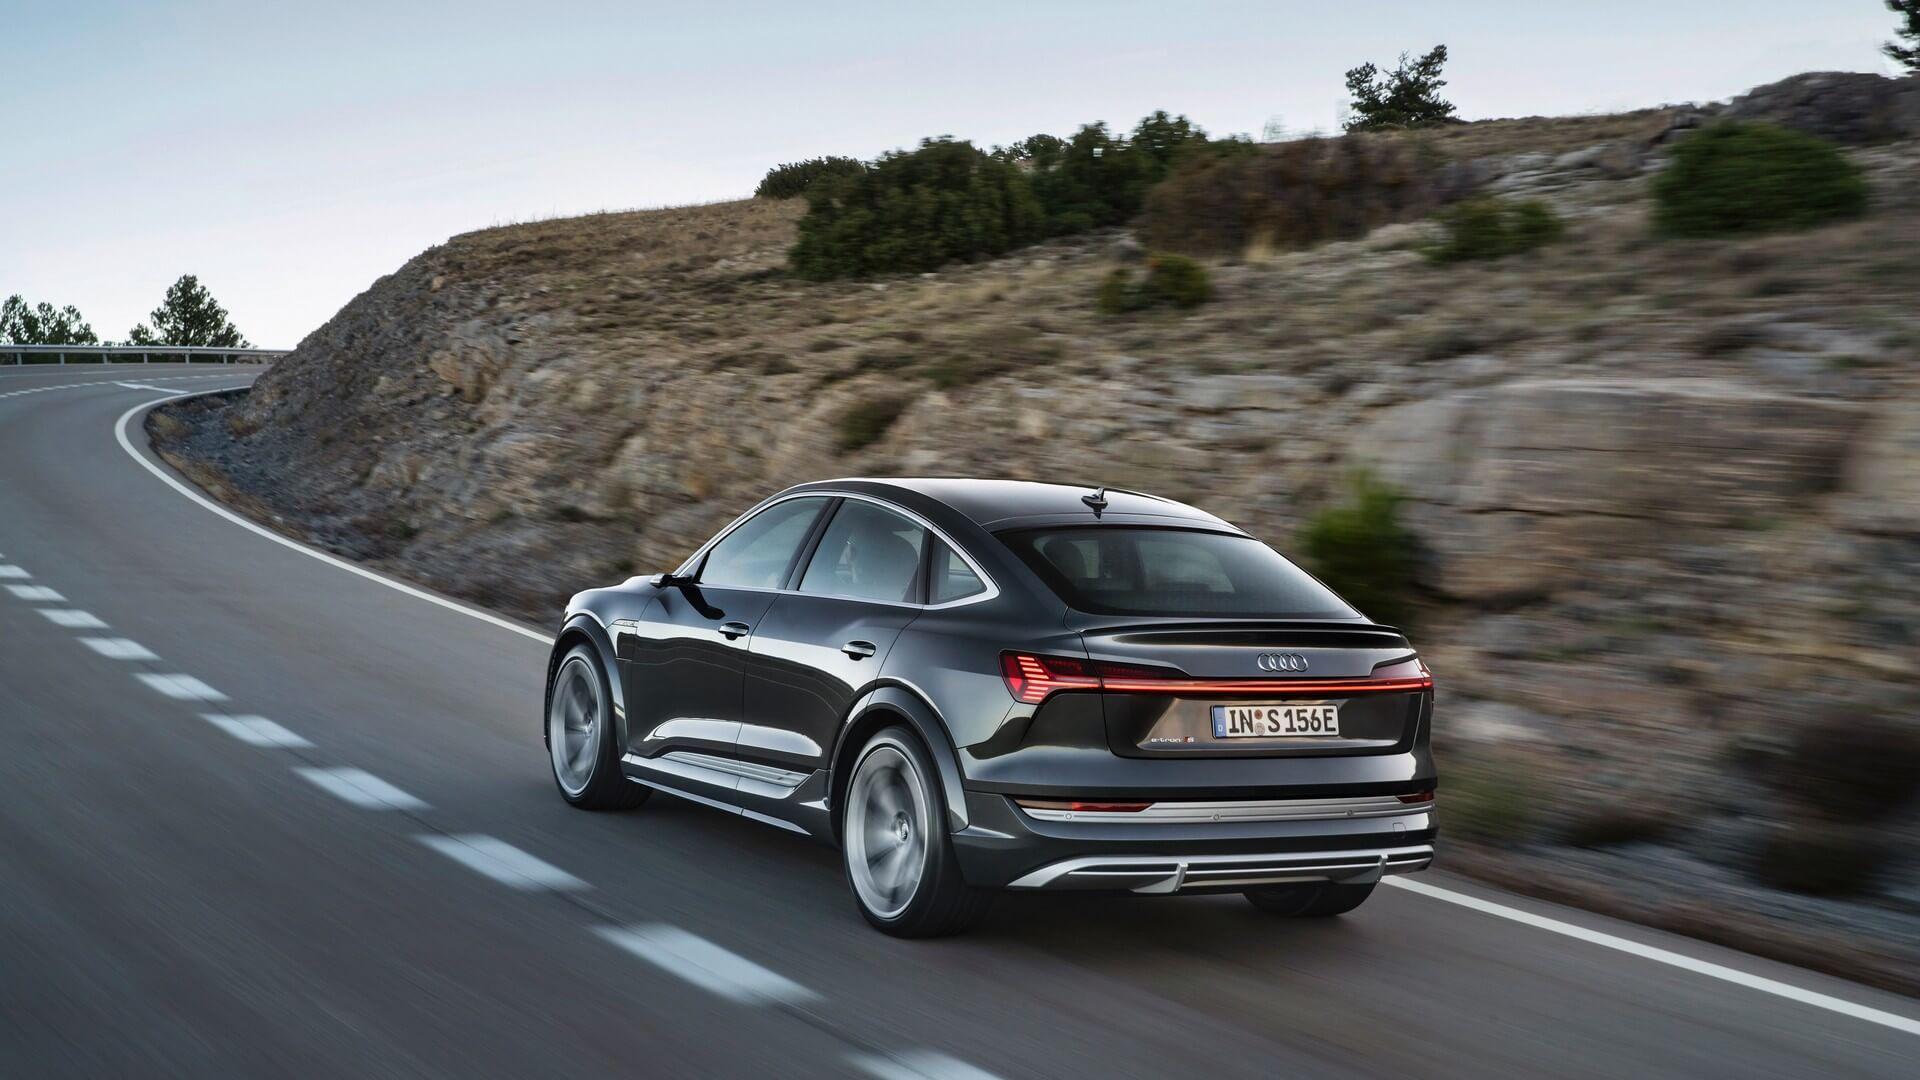 Audi-E-Tron-S-and-E-Tron-S-Sportback-2020-57